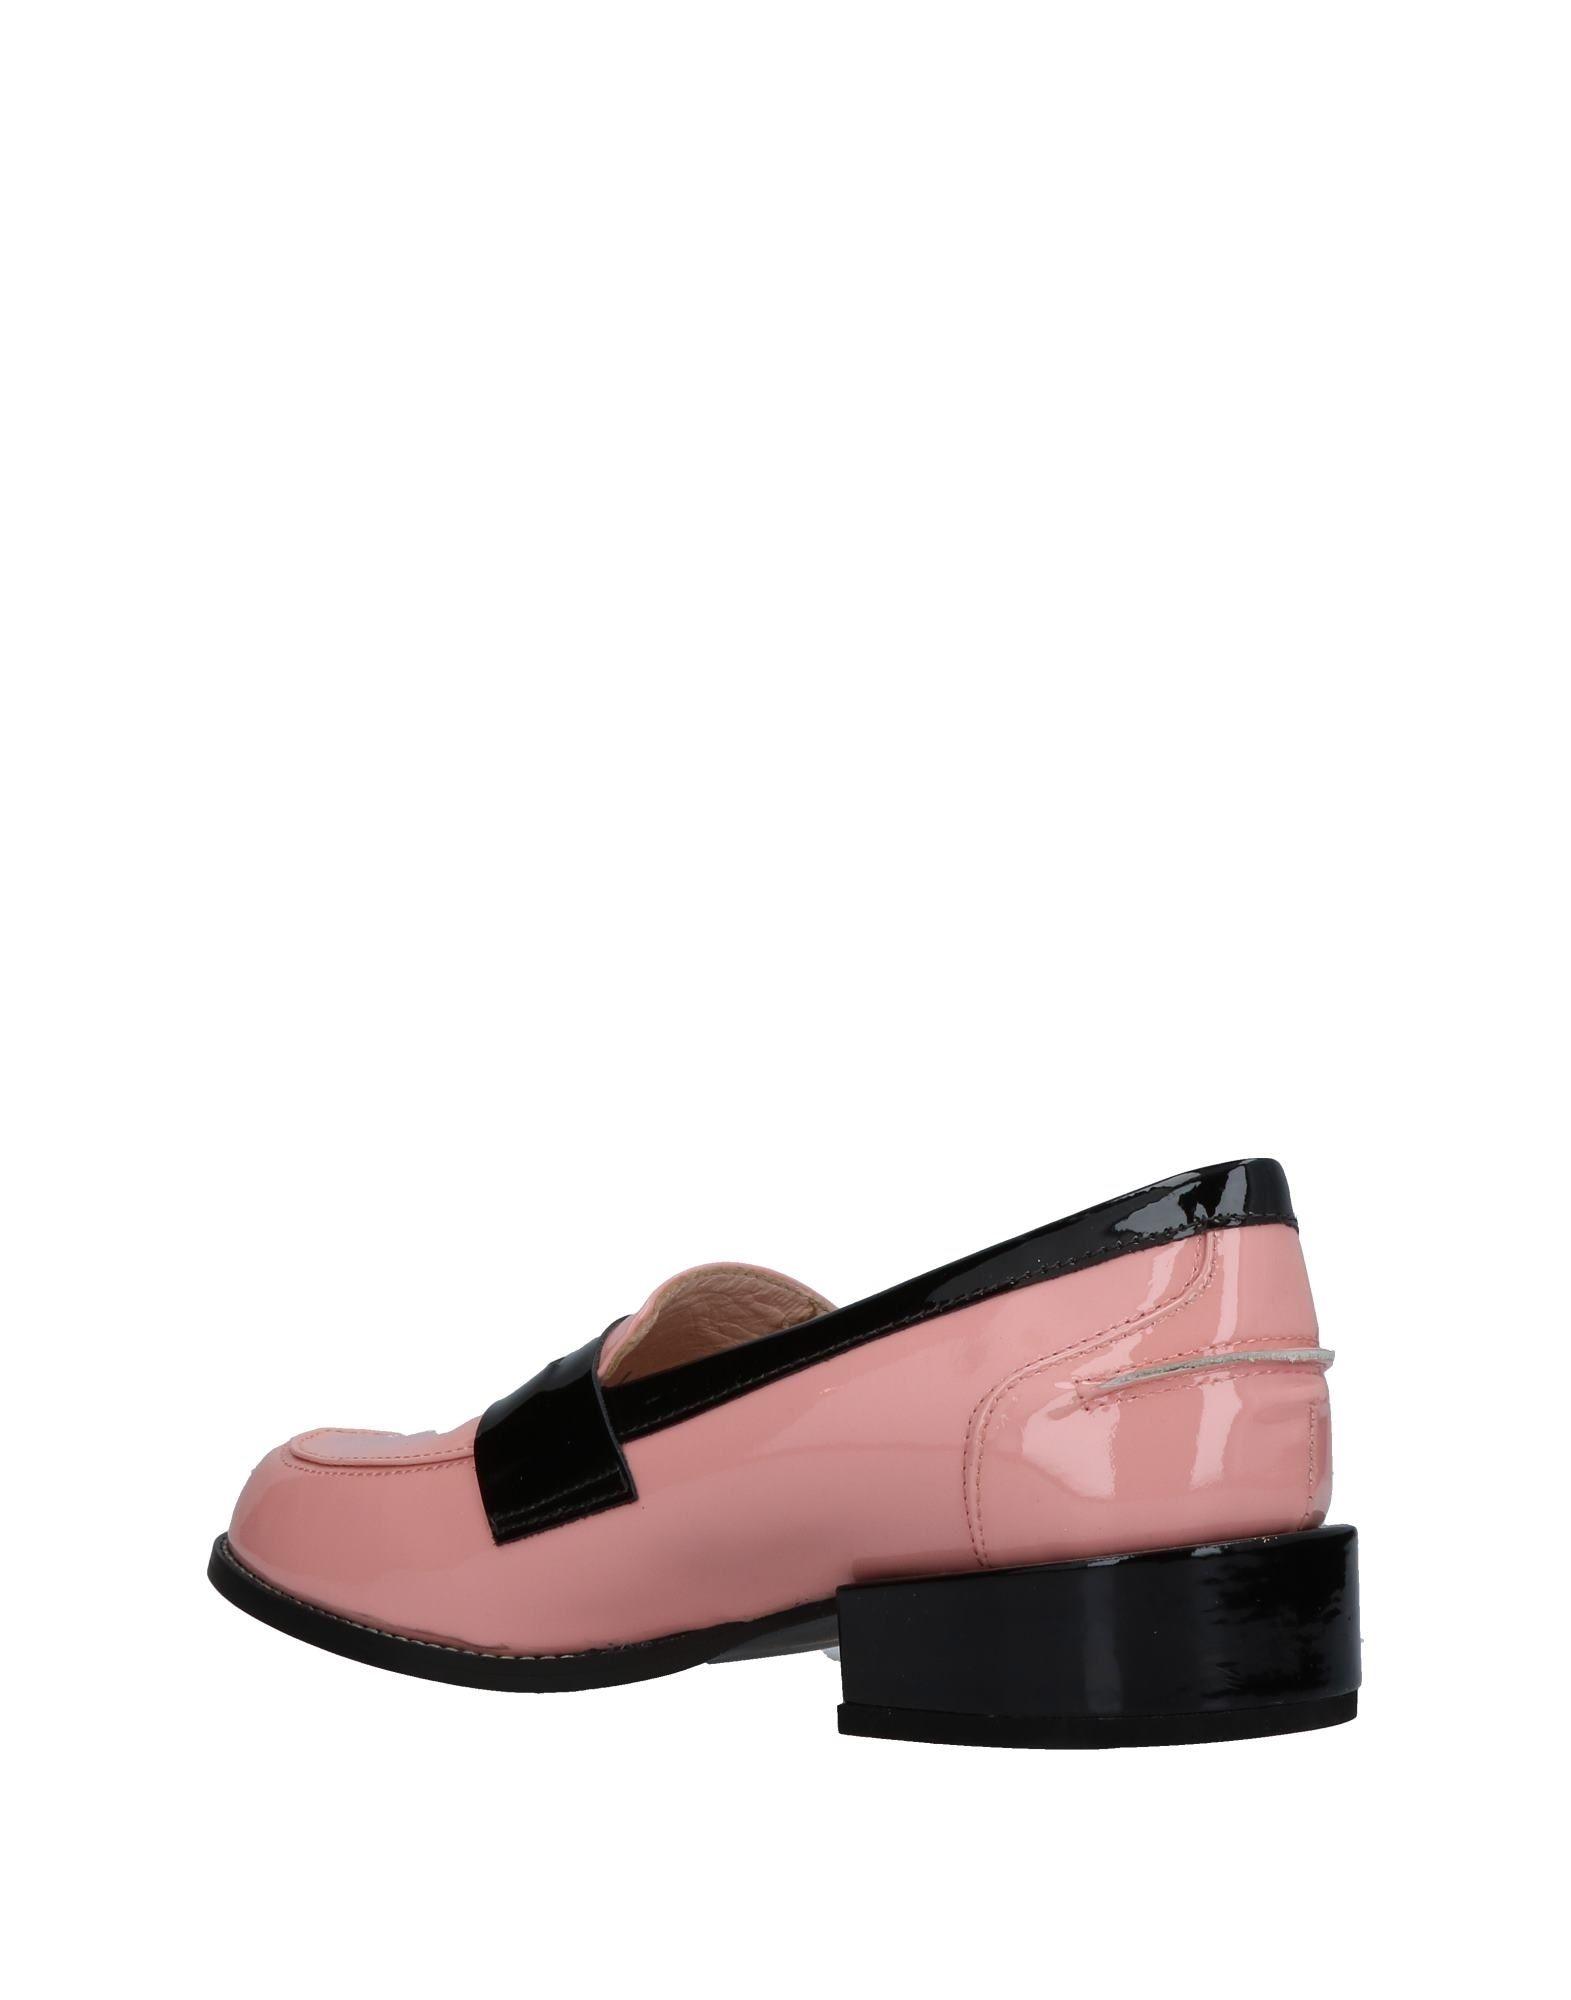 Tipe E Tacchi Mokassins Schuhe Damen  11408330SB Neue Schuhe Mokassins 6b3049